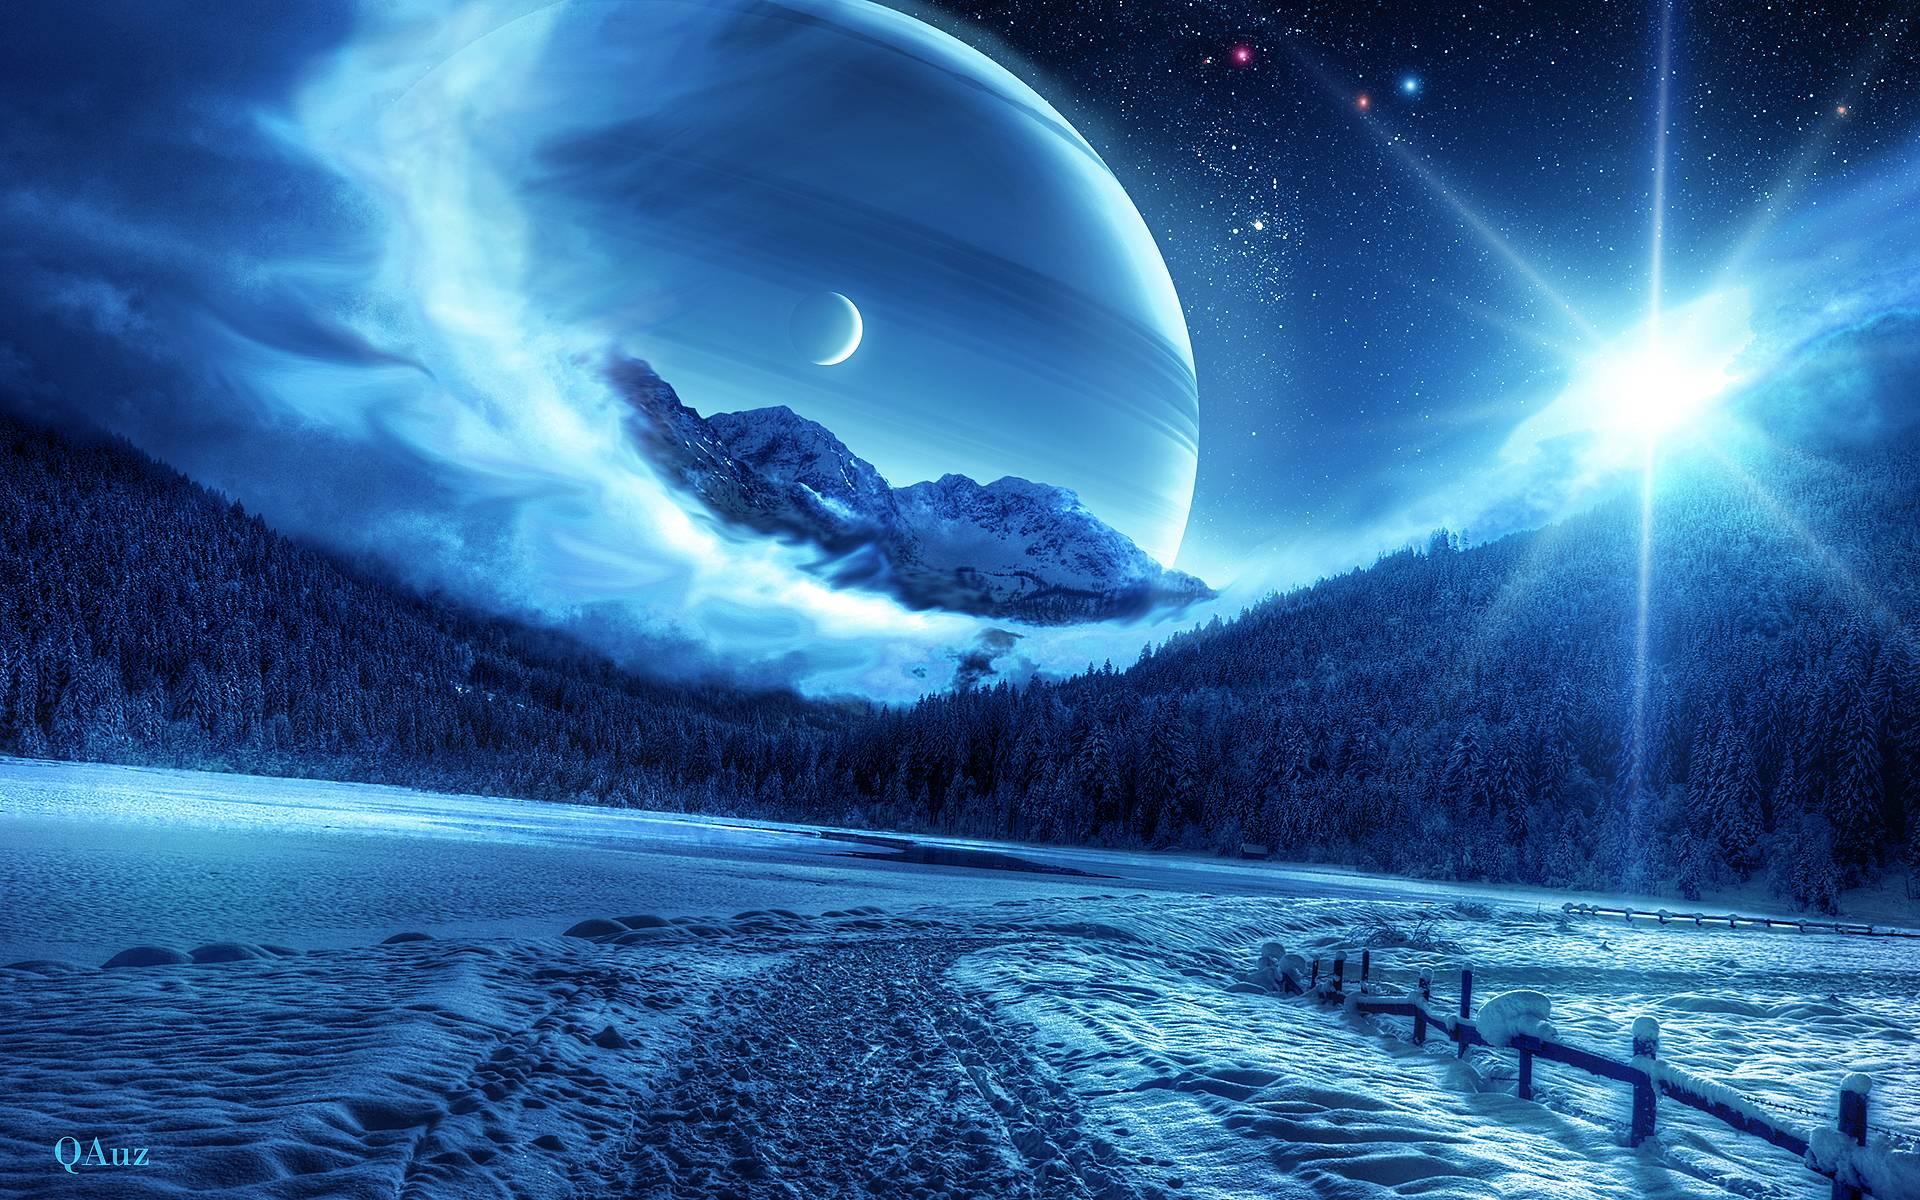 sun moon star background - photo #13